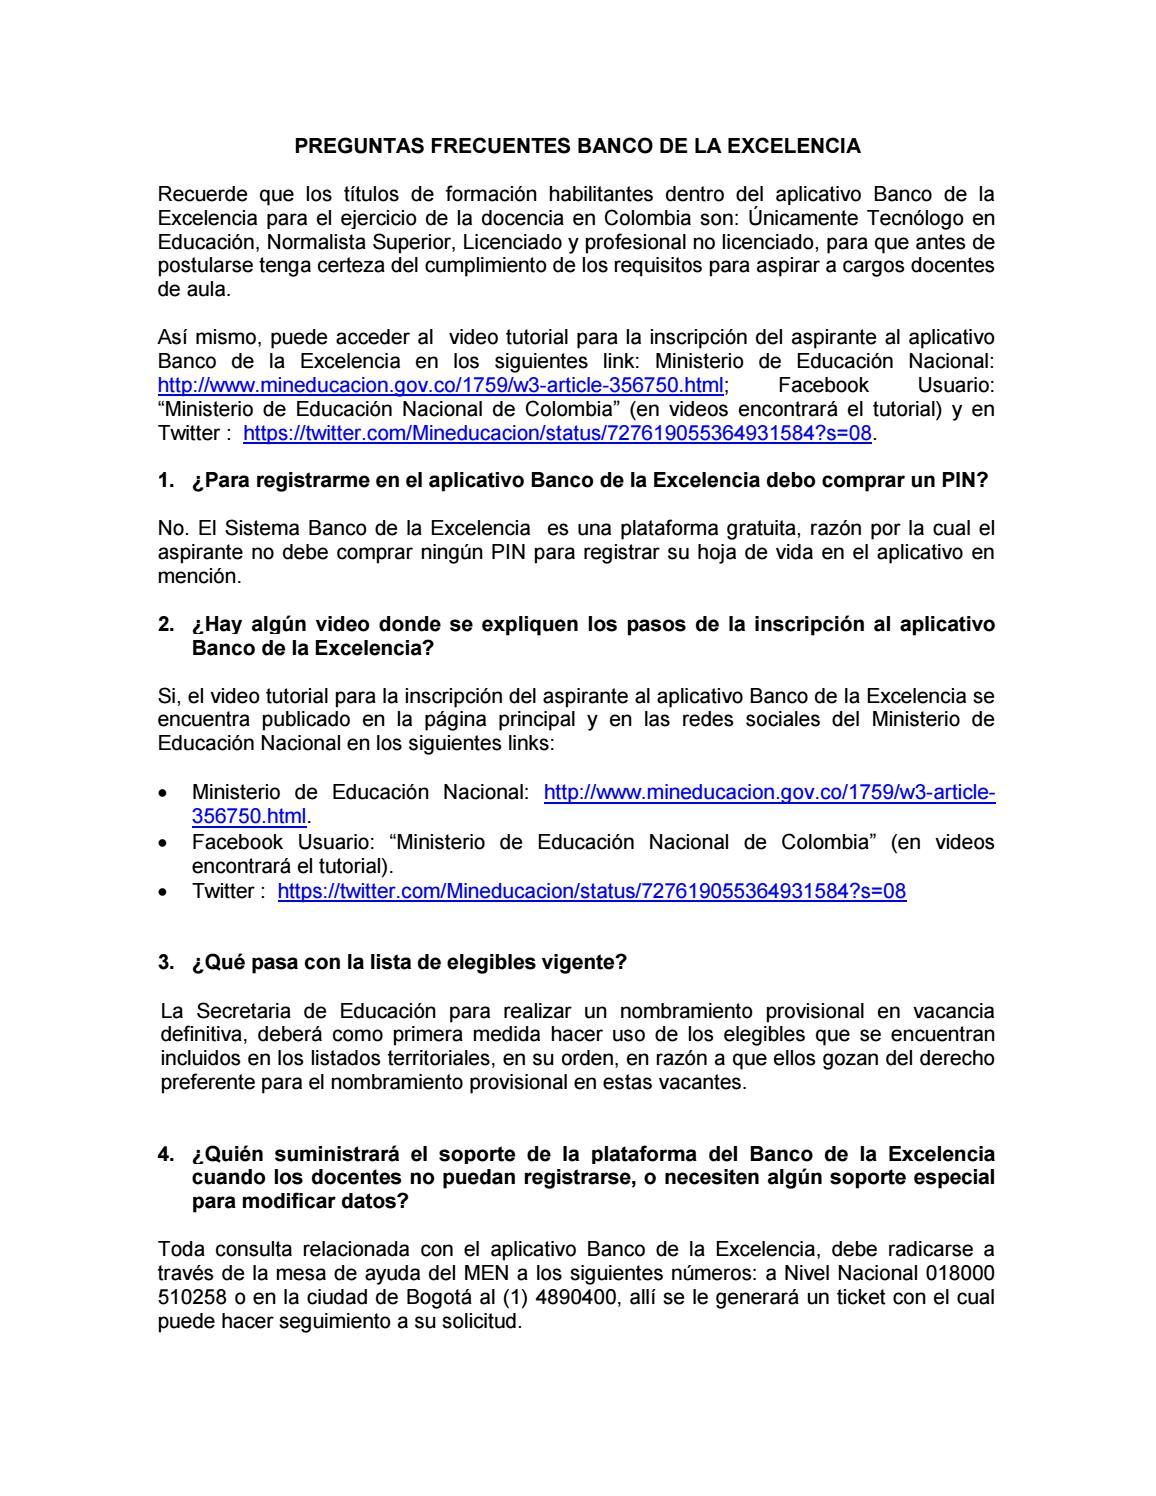 Faqs banco excelencia by MAGNIFIC ART - issuu